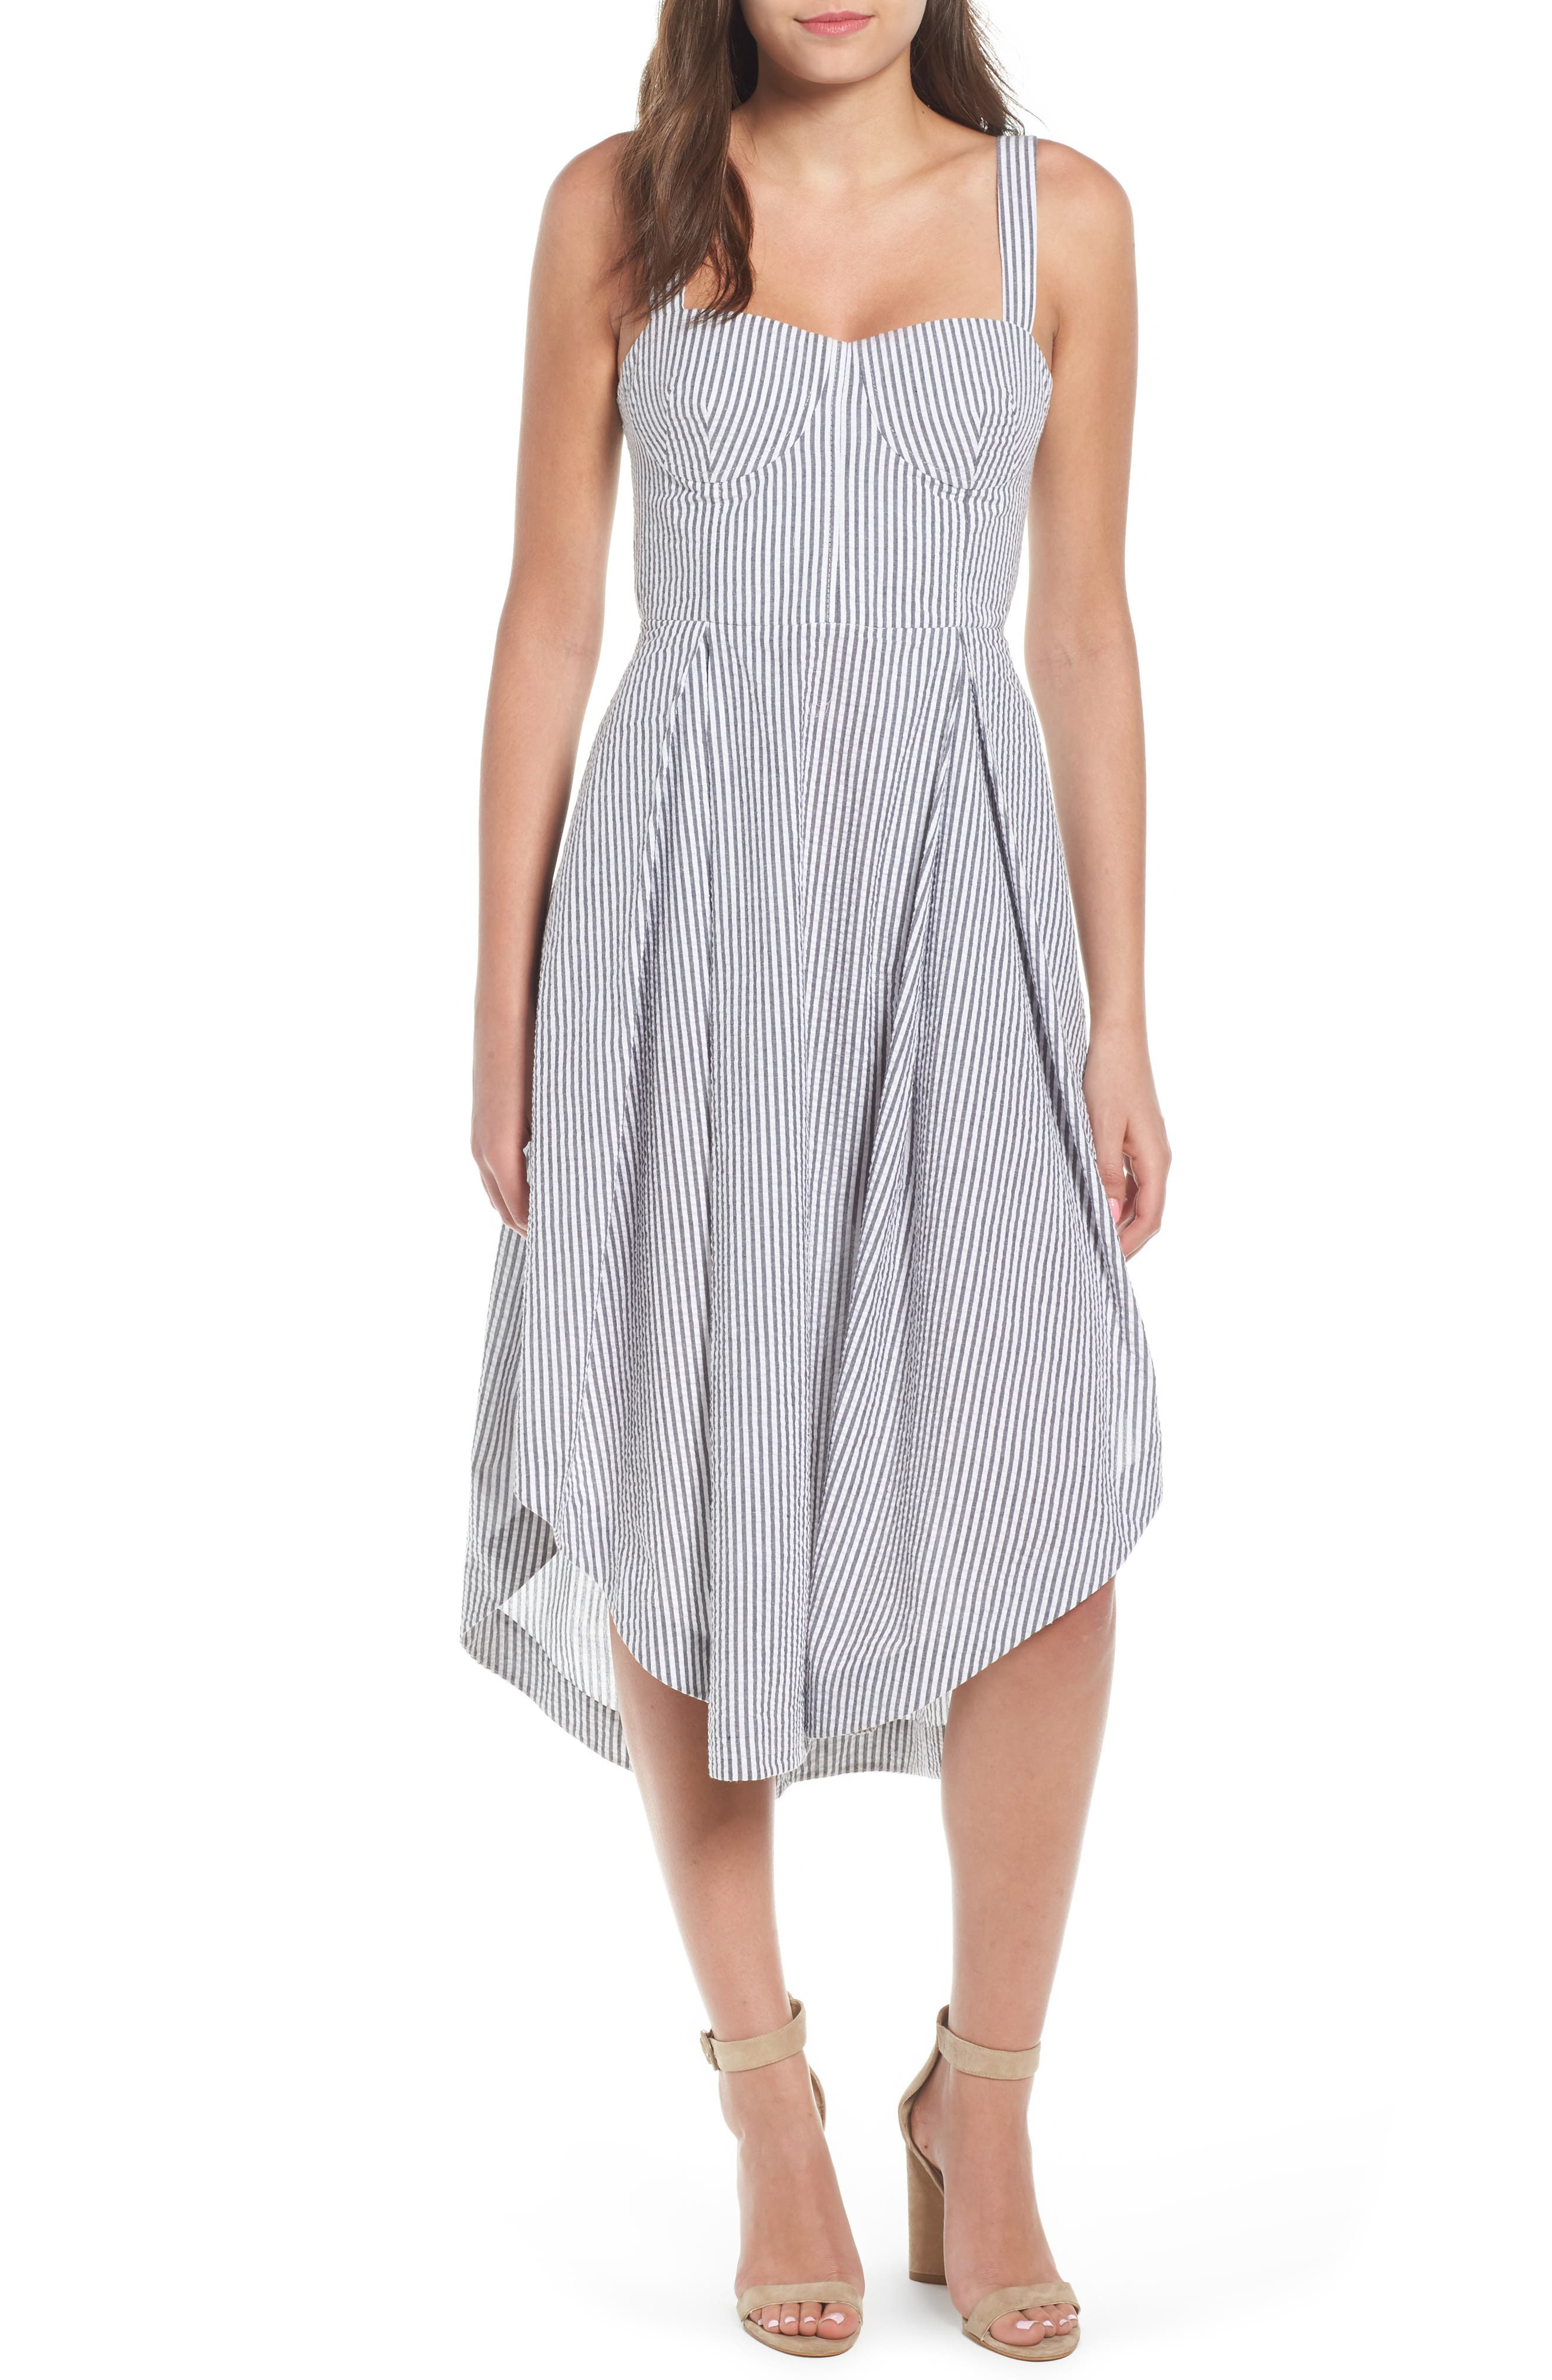 KENDALL + KYLIE Seersucker Bustier Midi Dress